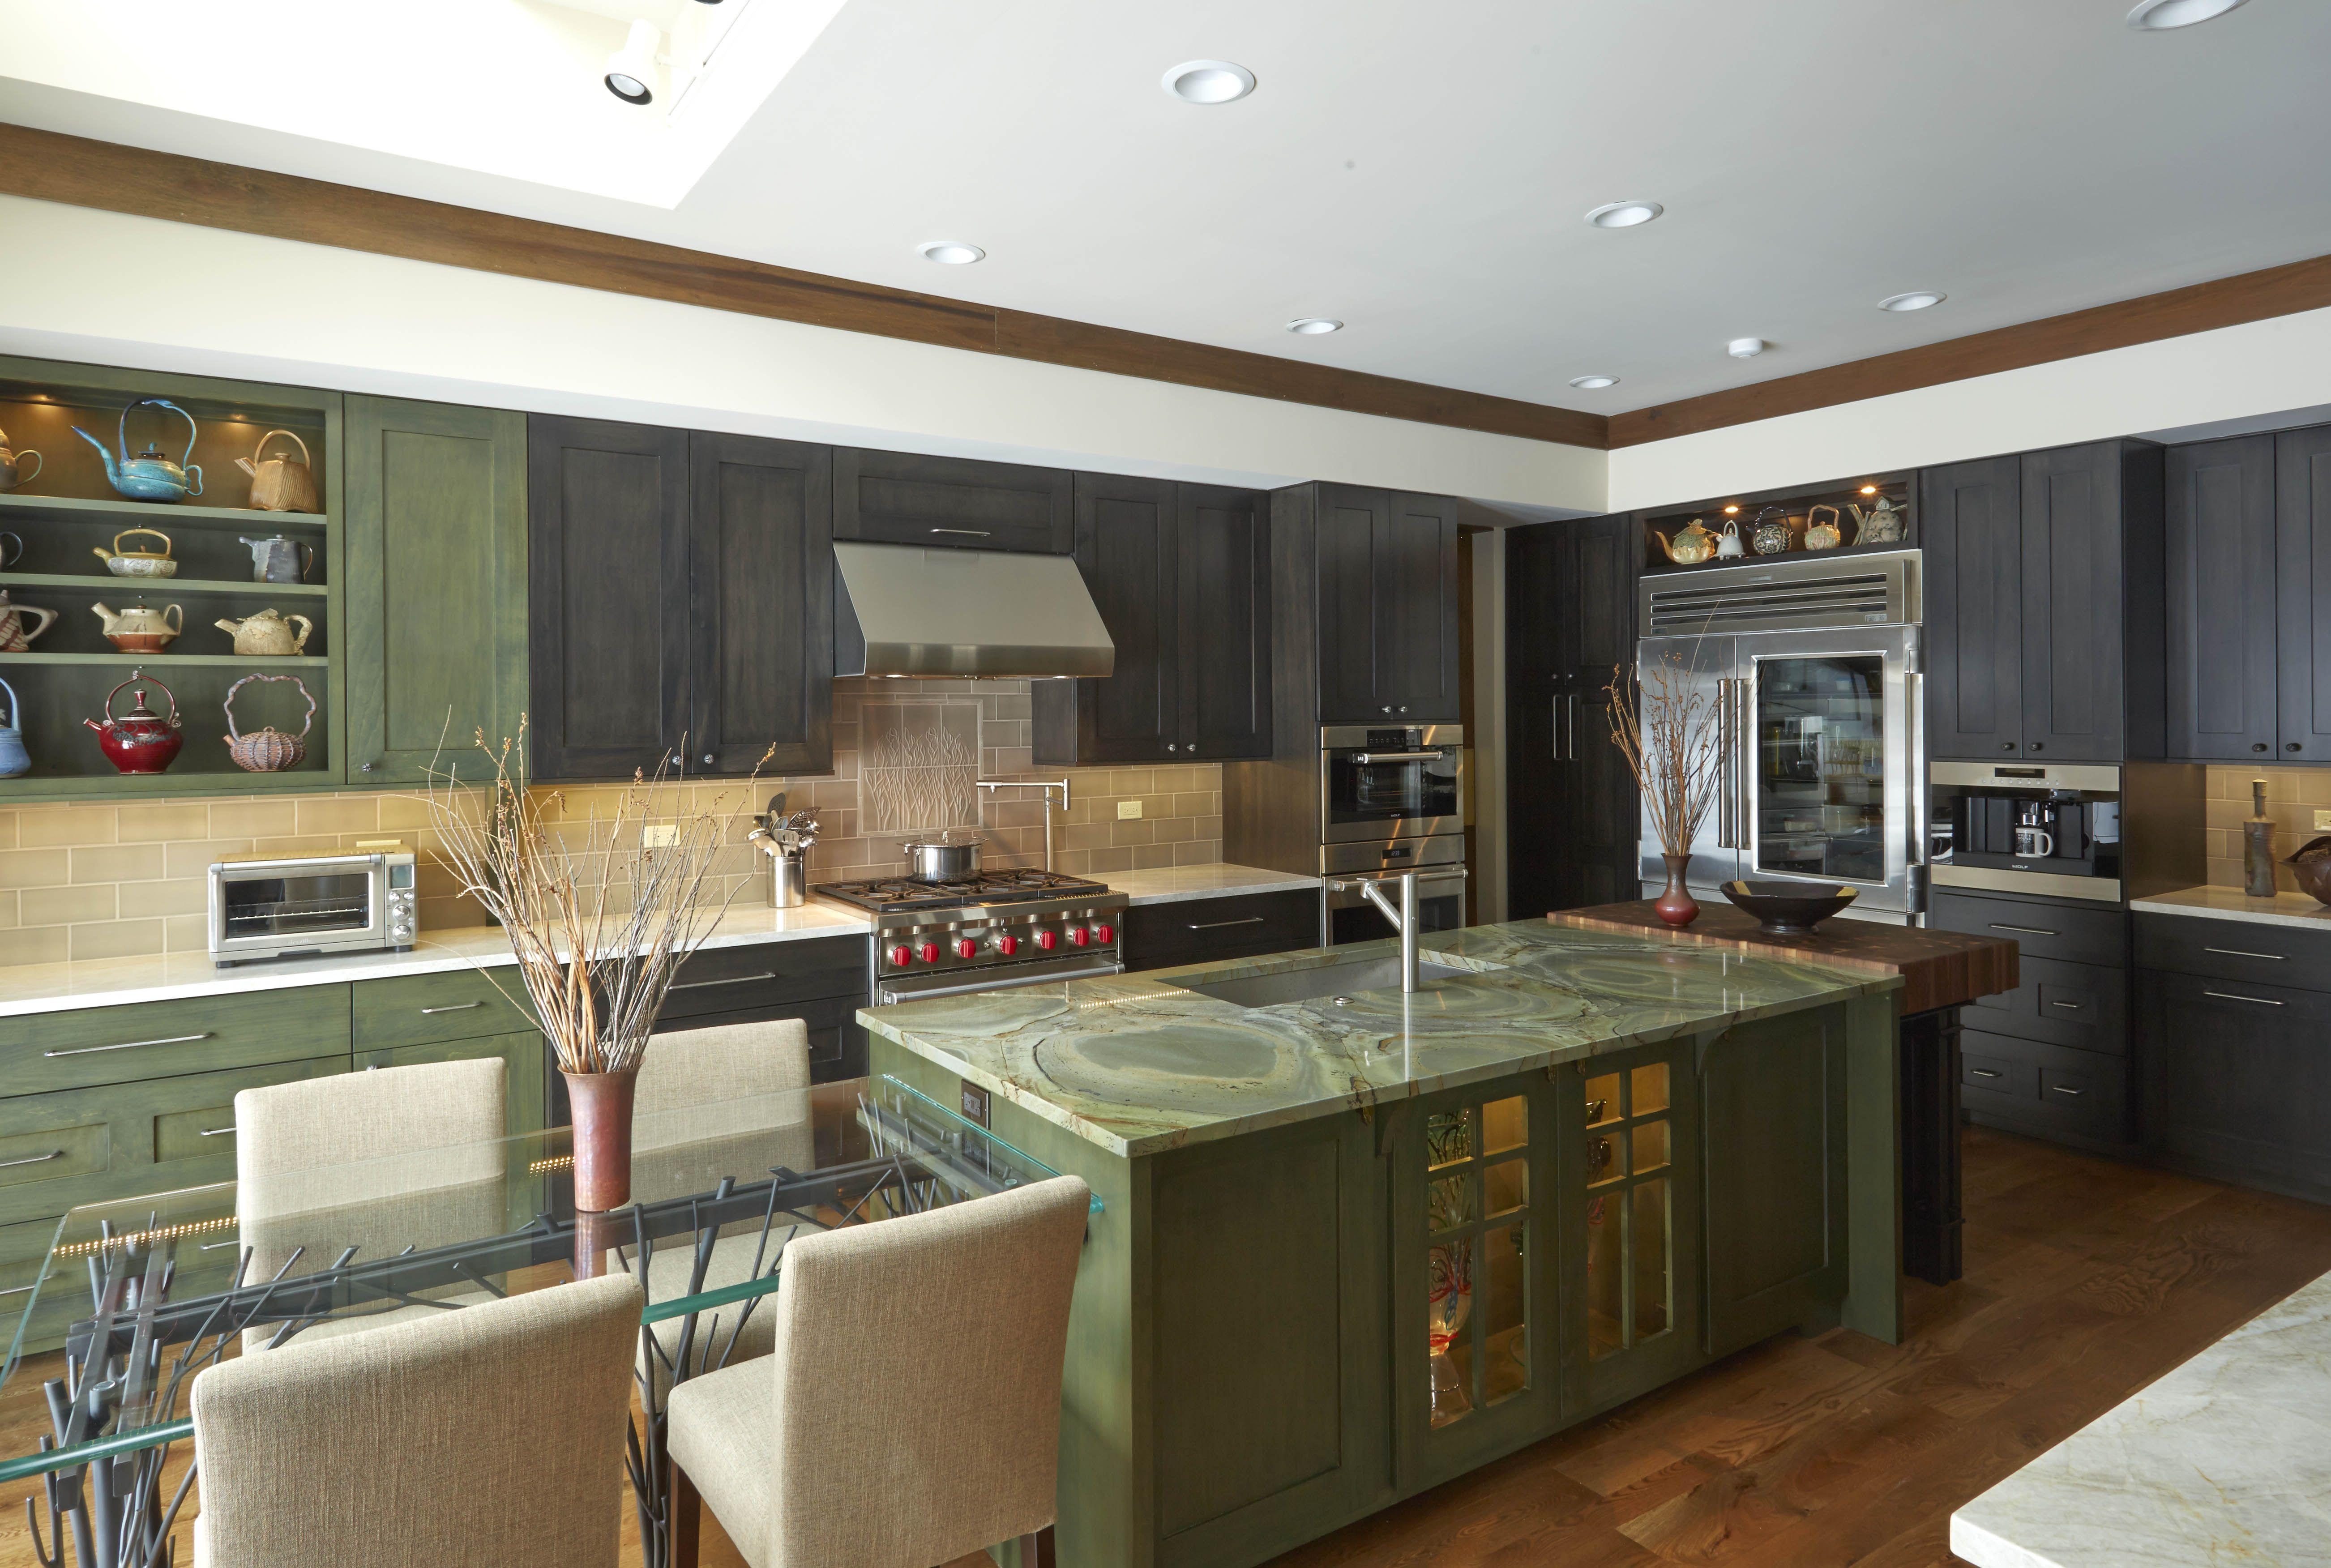 Uncategorized Kitchen Design Group prairie style kitchen designed by lisa murphy ddk design group glenview il